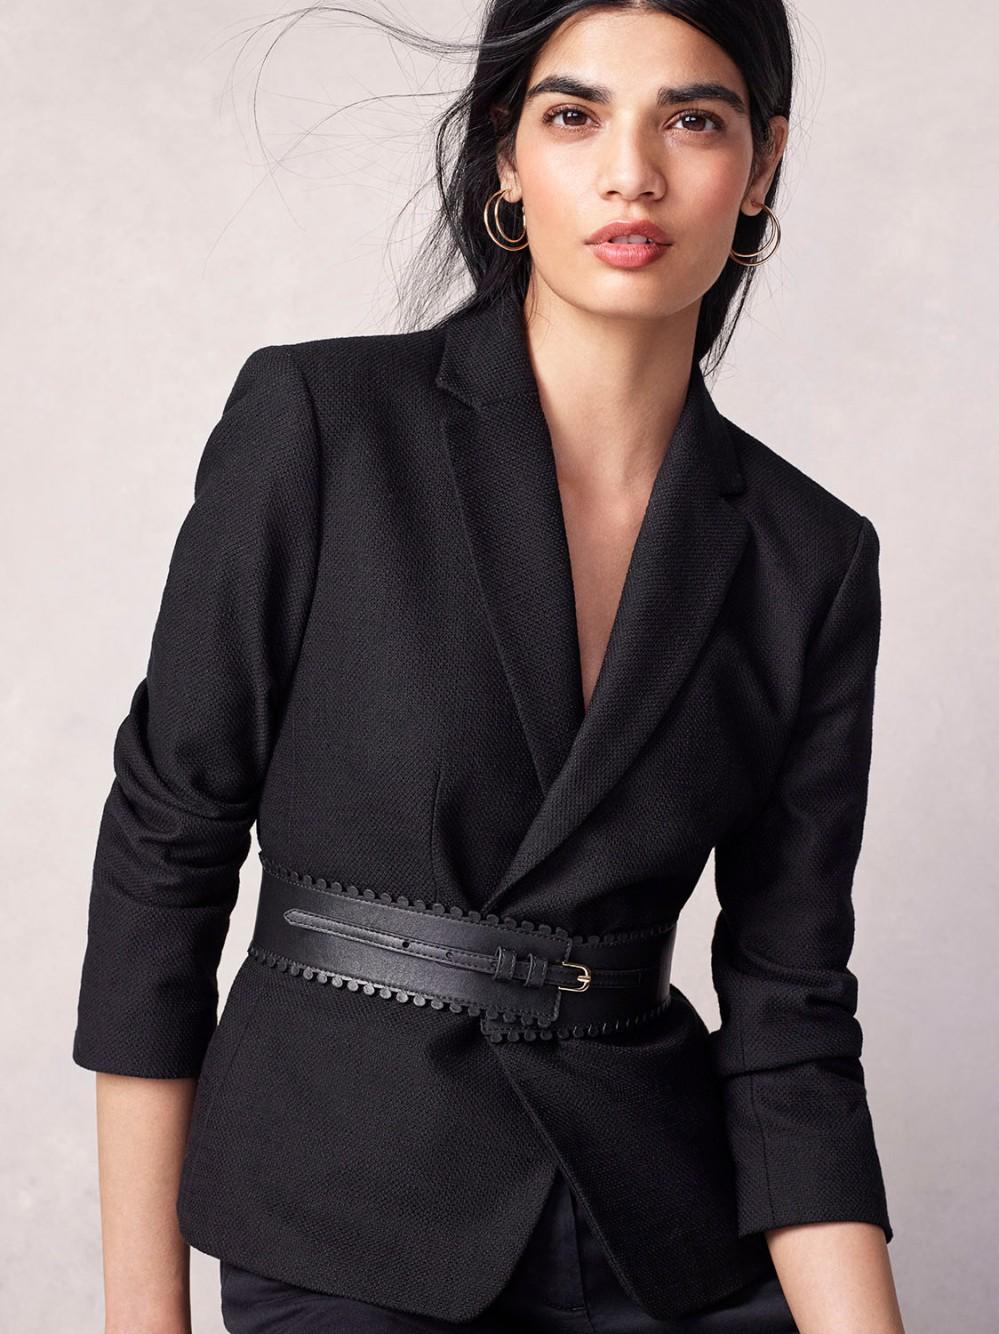 Ann Taylor_MEI TAO_Thomas Treuhaft_April17_Dresses_Fashion Photography 3